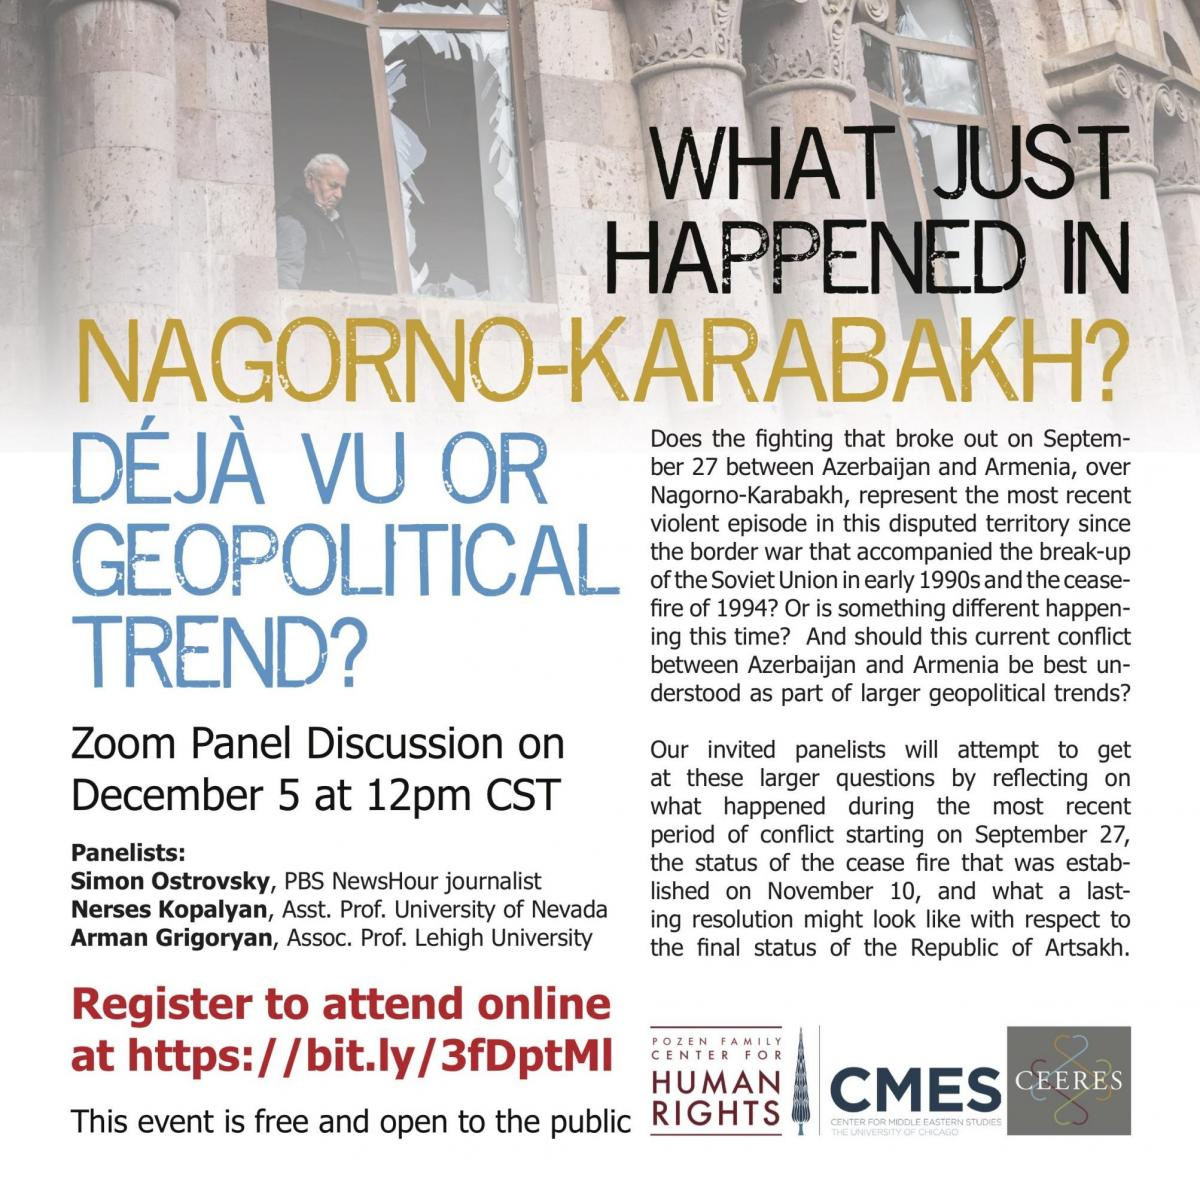 What Just Happened in Nagorno-Karabakh: Deja Vu or Geopolitical Trend?